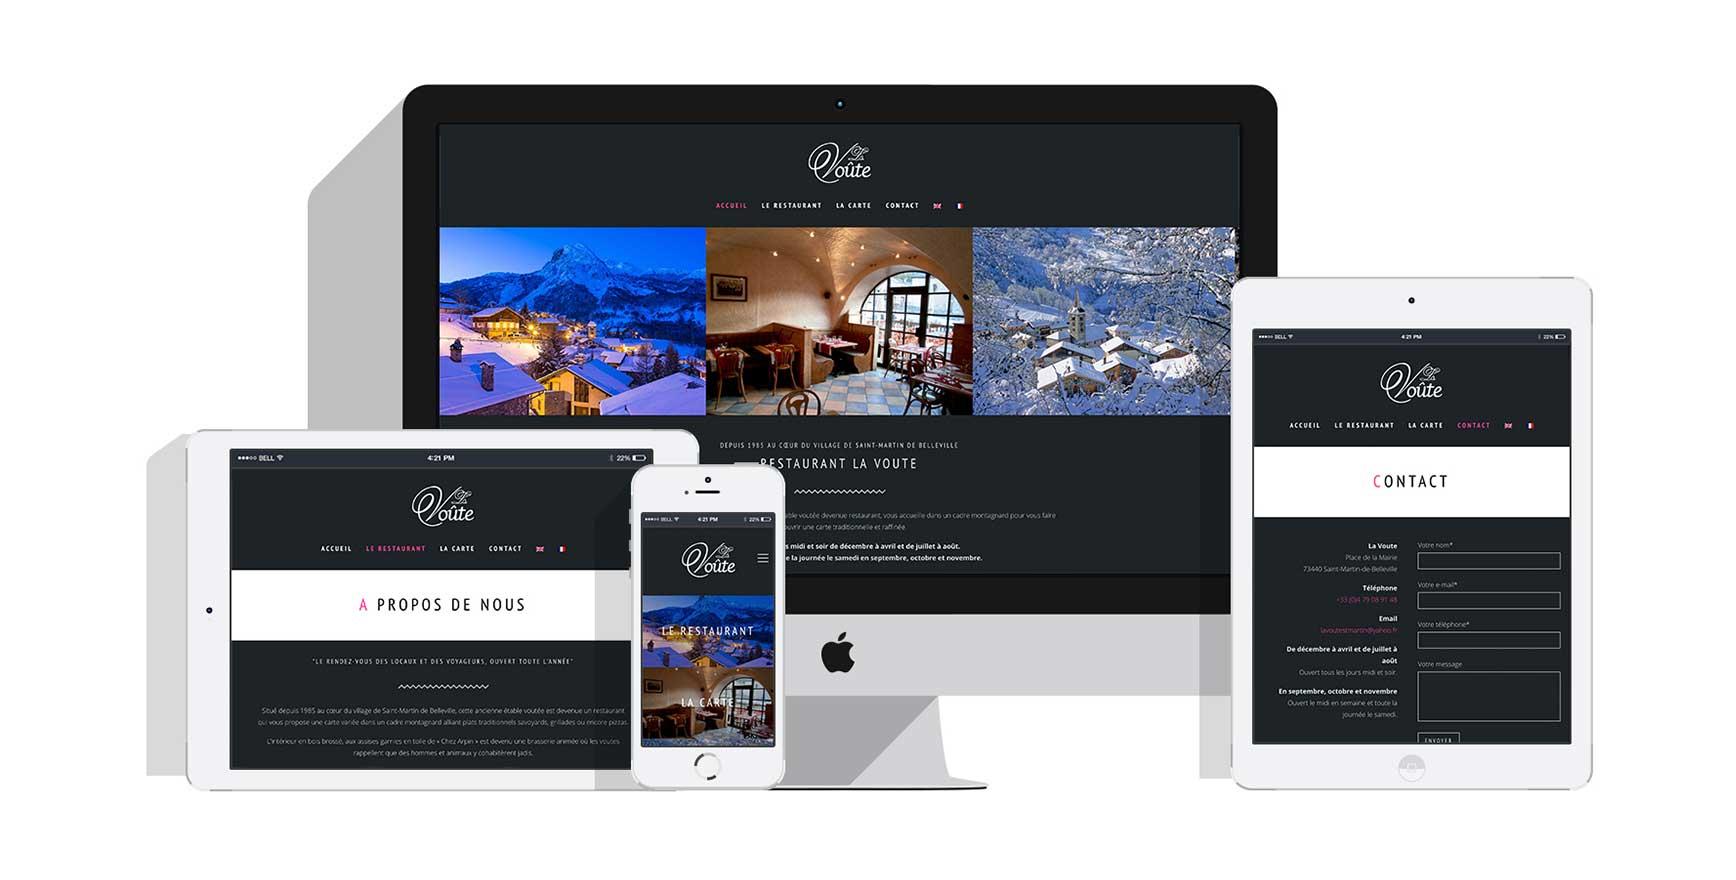 portfolio-la-voute-site-florence-borrel-flobo-design-graphique-infographie-webdesign-savoie-tarentaise-meribel-menuires-courchevel